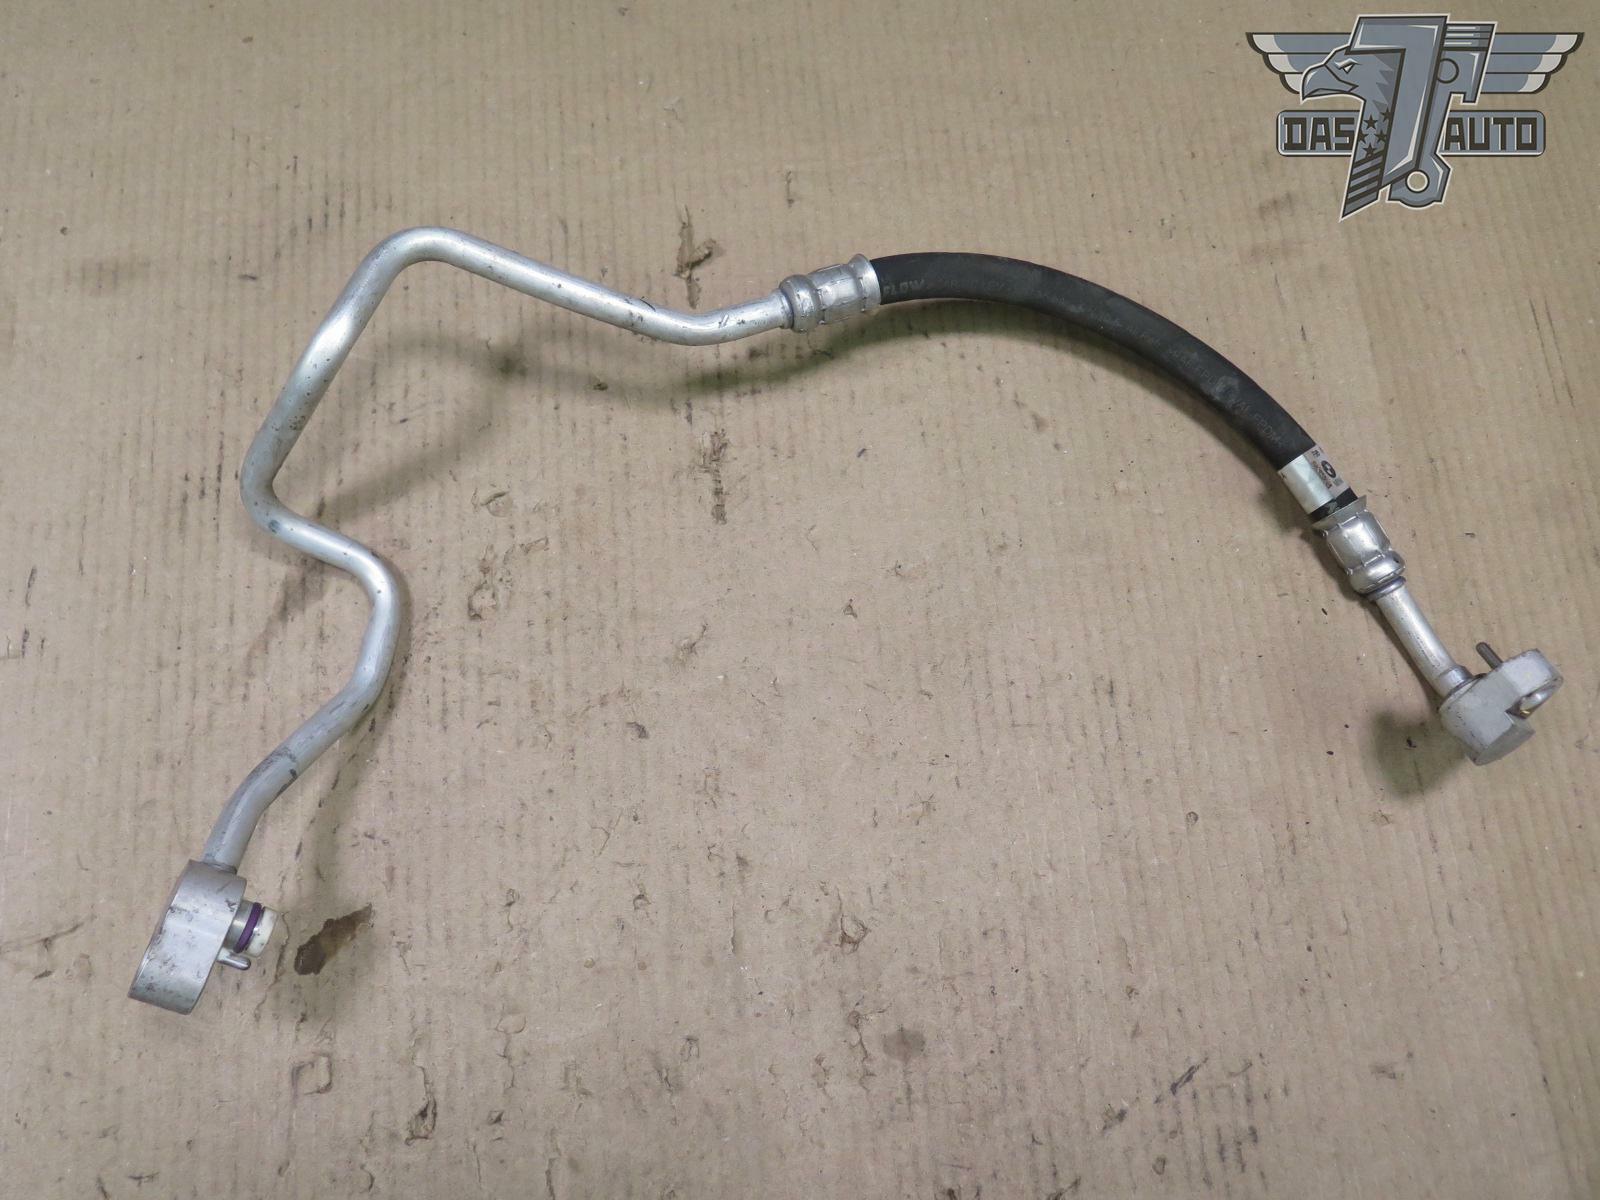 BMW MINI Cooper F55 F56 F57 F60 Pressure Hose Compressor 9209726